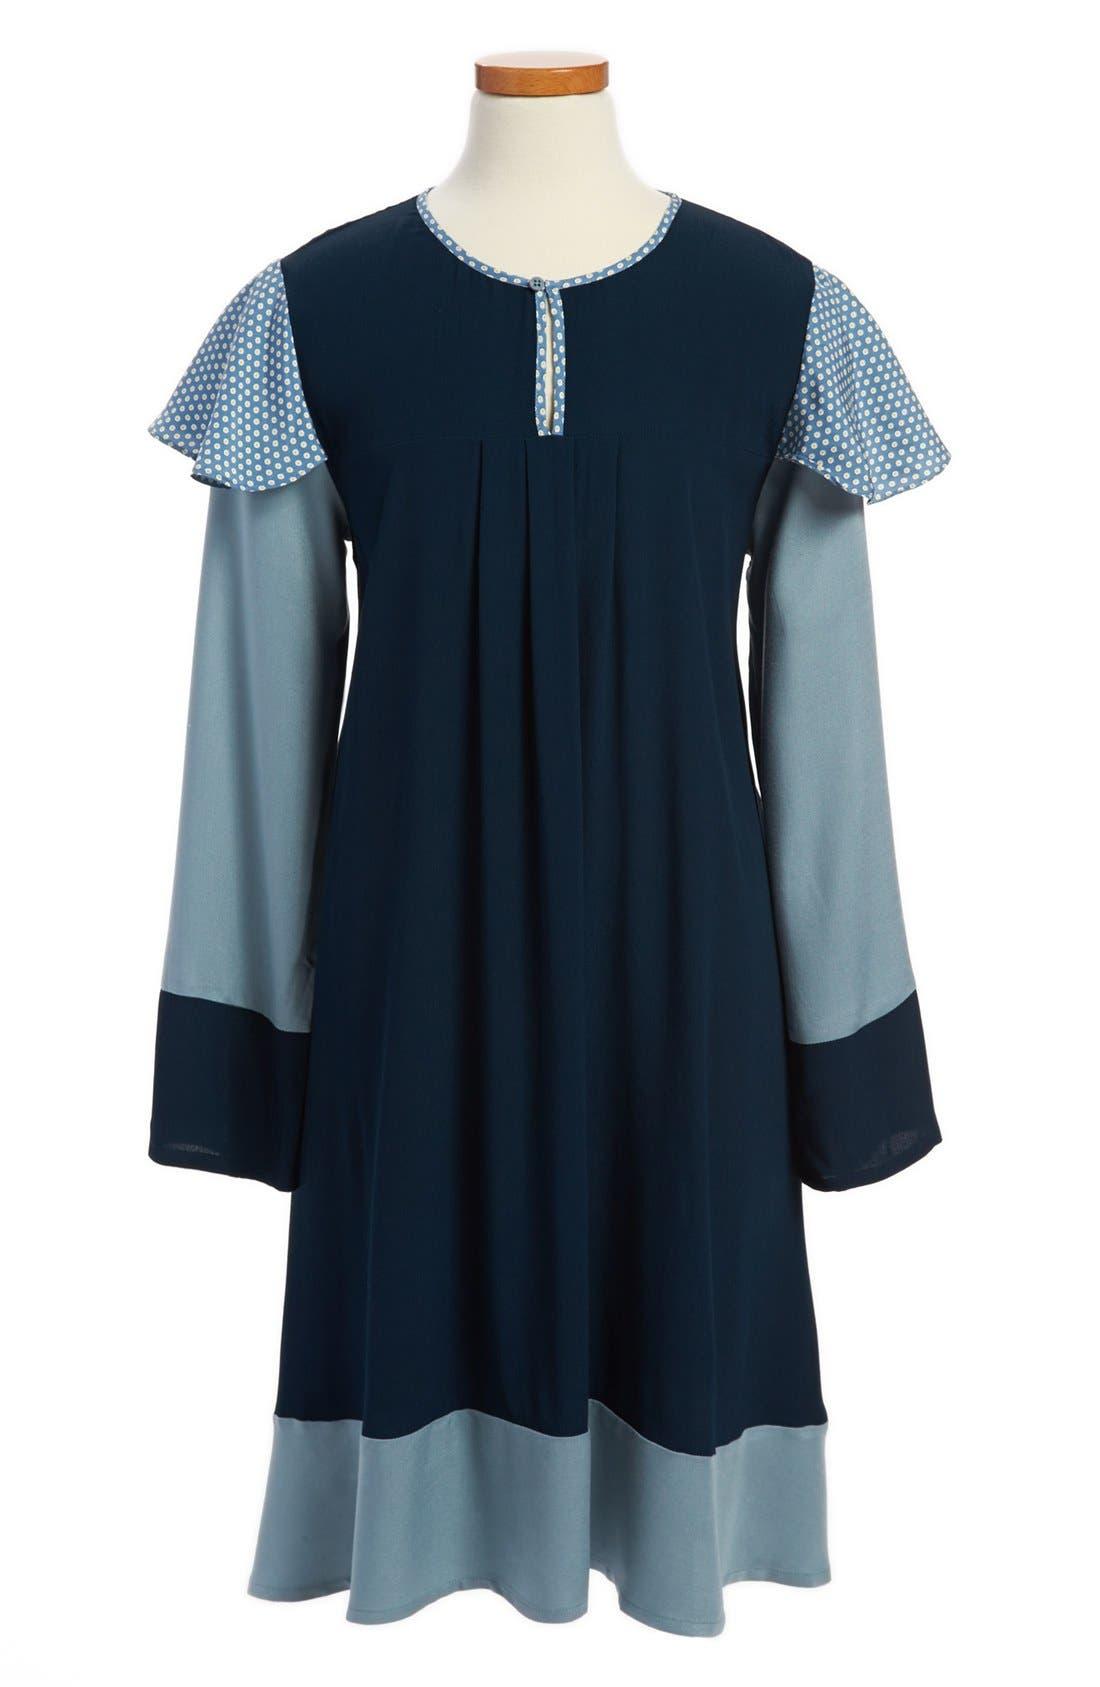 Alternate Image 1 Selected - Stella McCartney Kids 'Lydia' Dress (Toddler Girls, Little Girls & Big Girls)